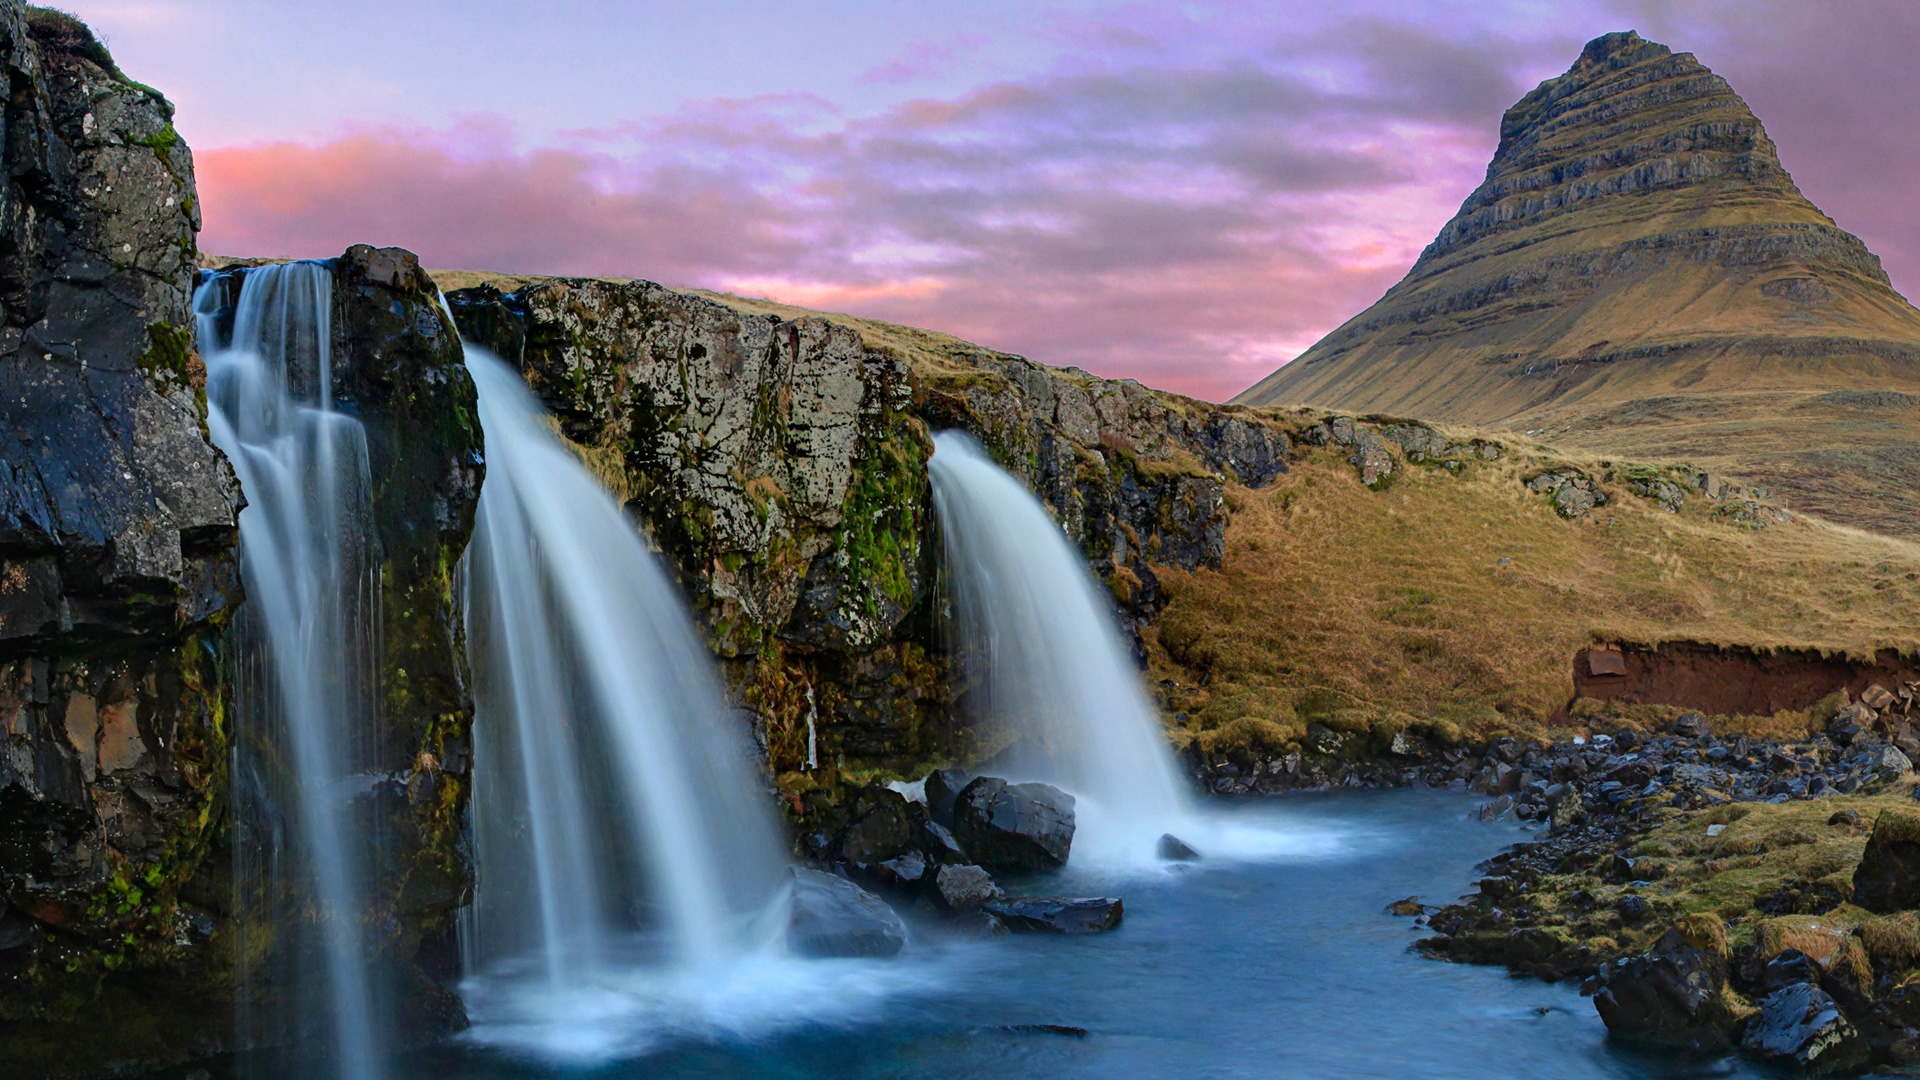 Kirkjufell Mountain and waterfall wallpaper